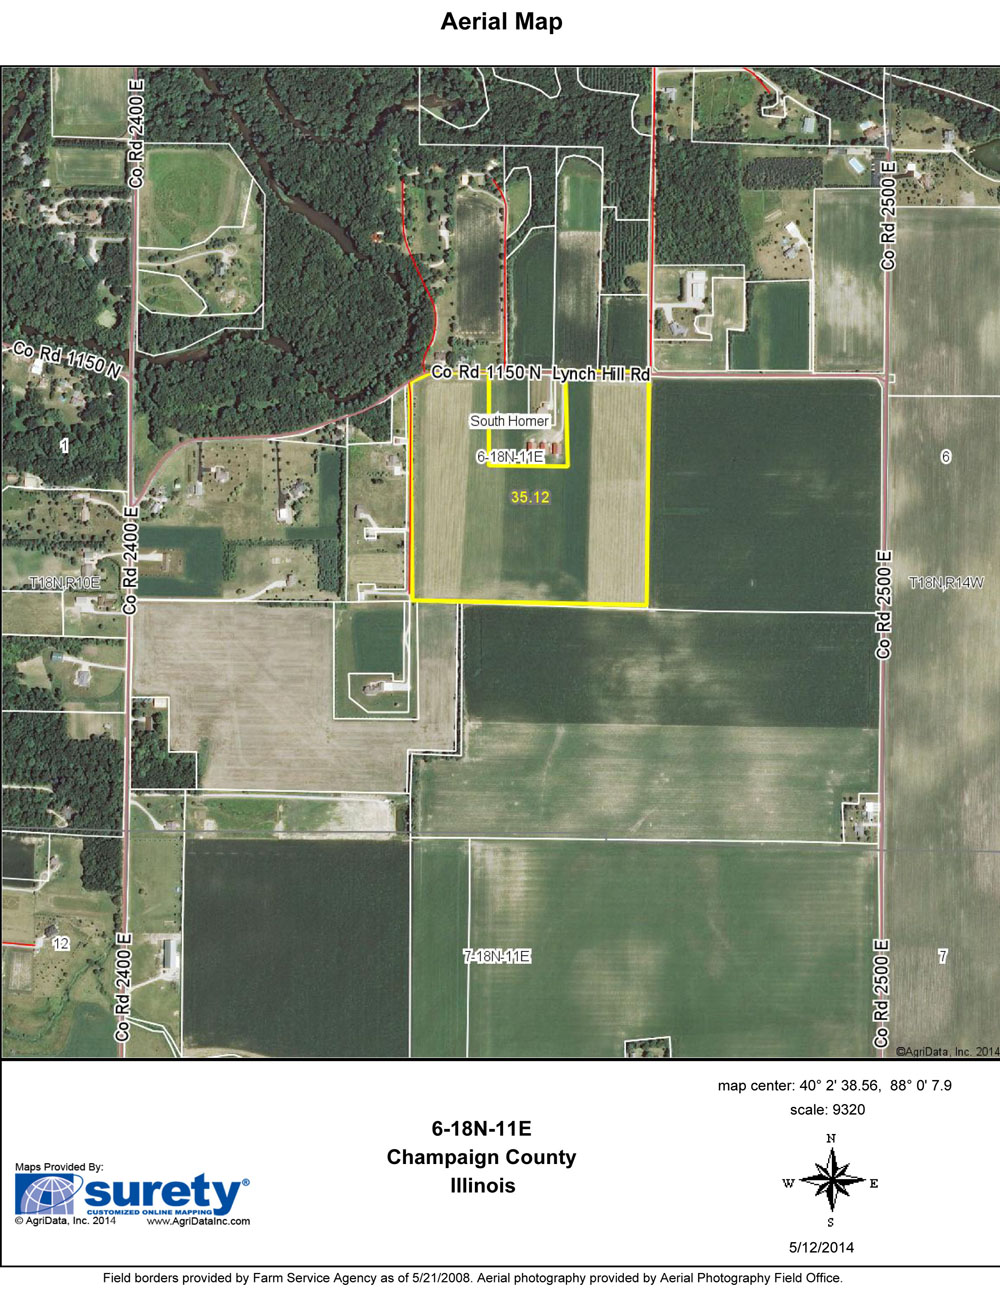 Illinois vermilion county armstrong - Homer Farm